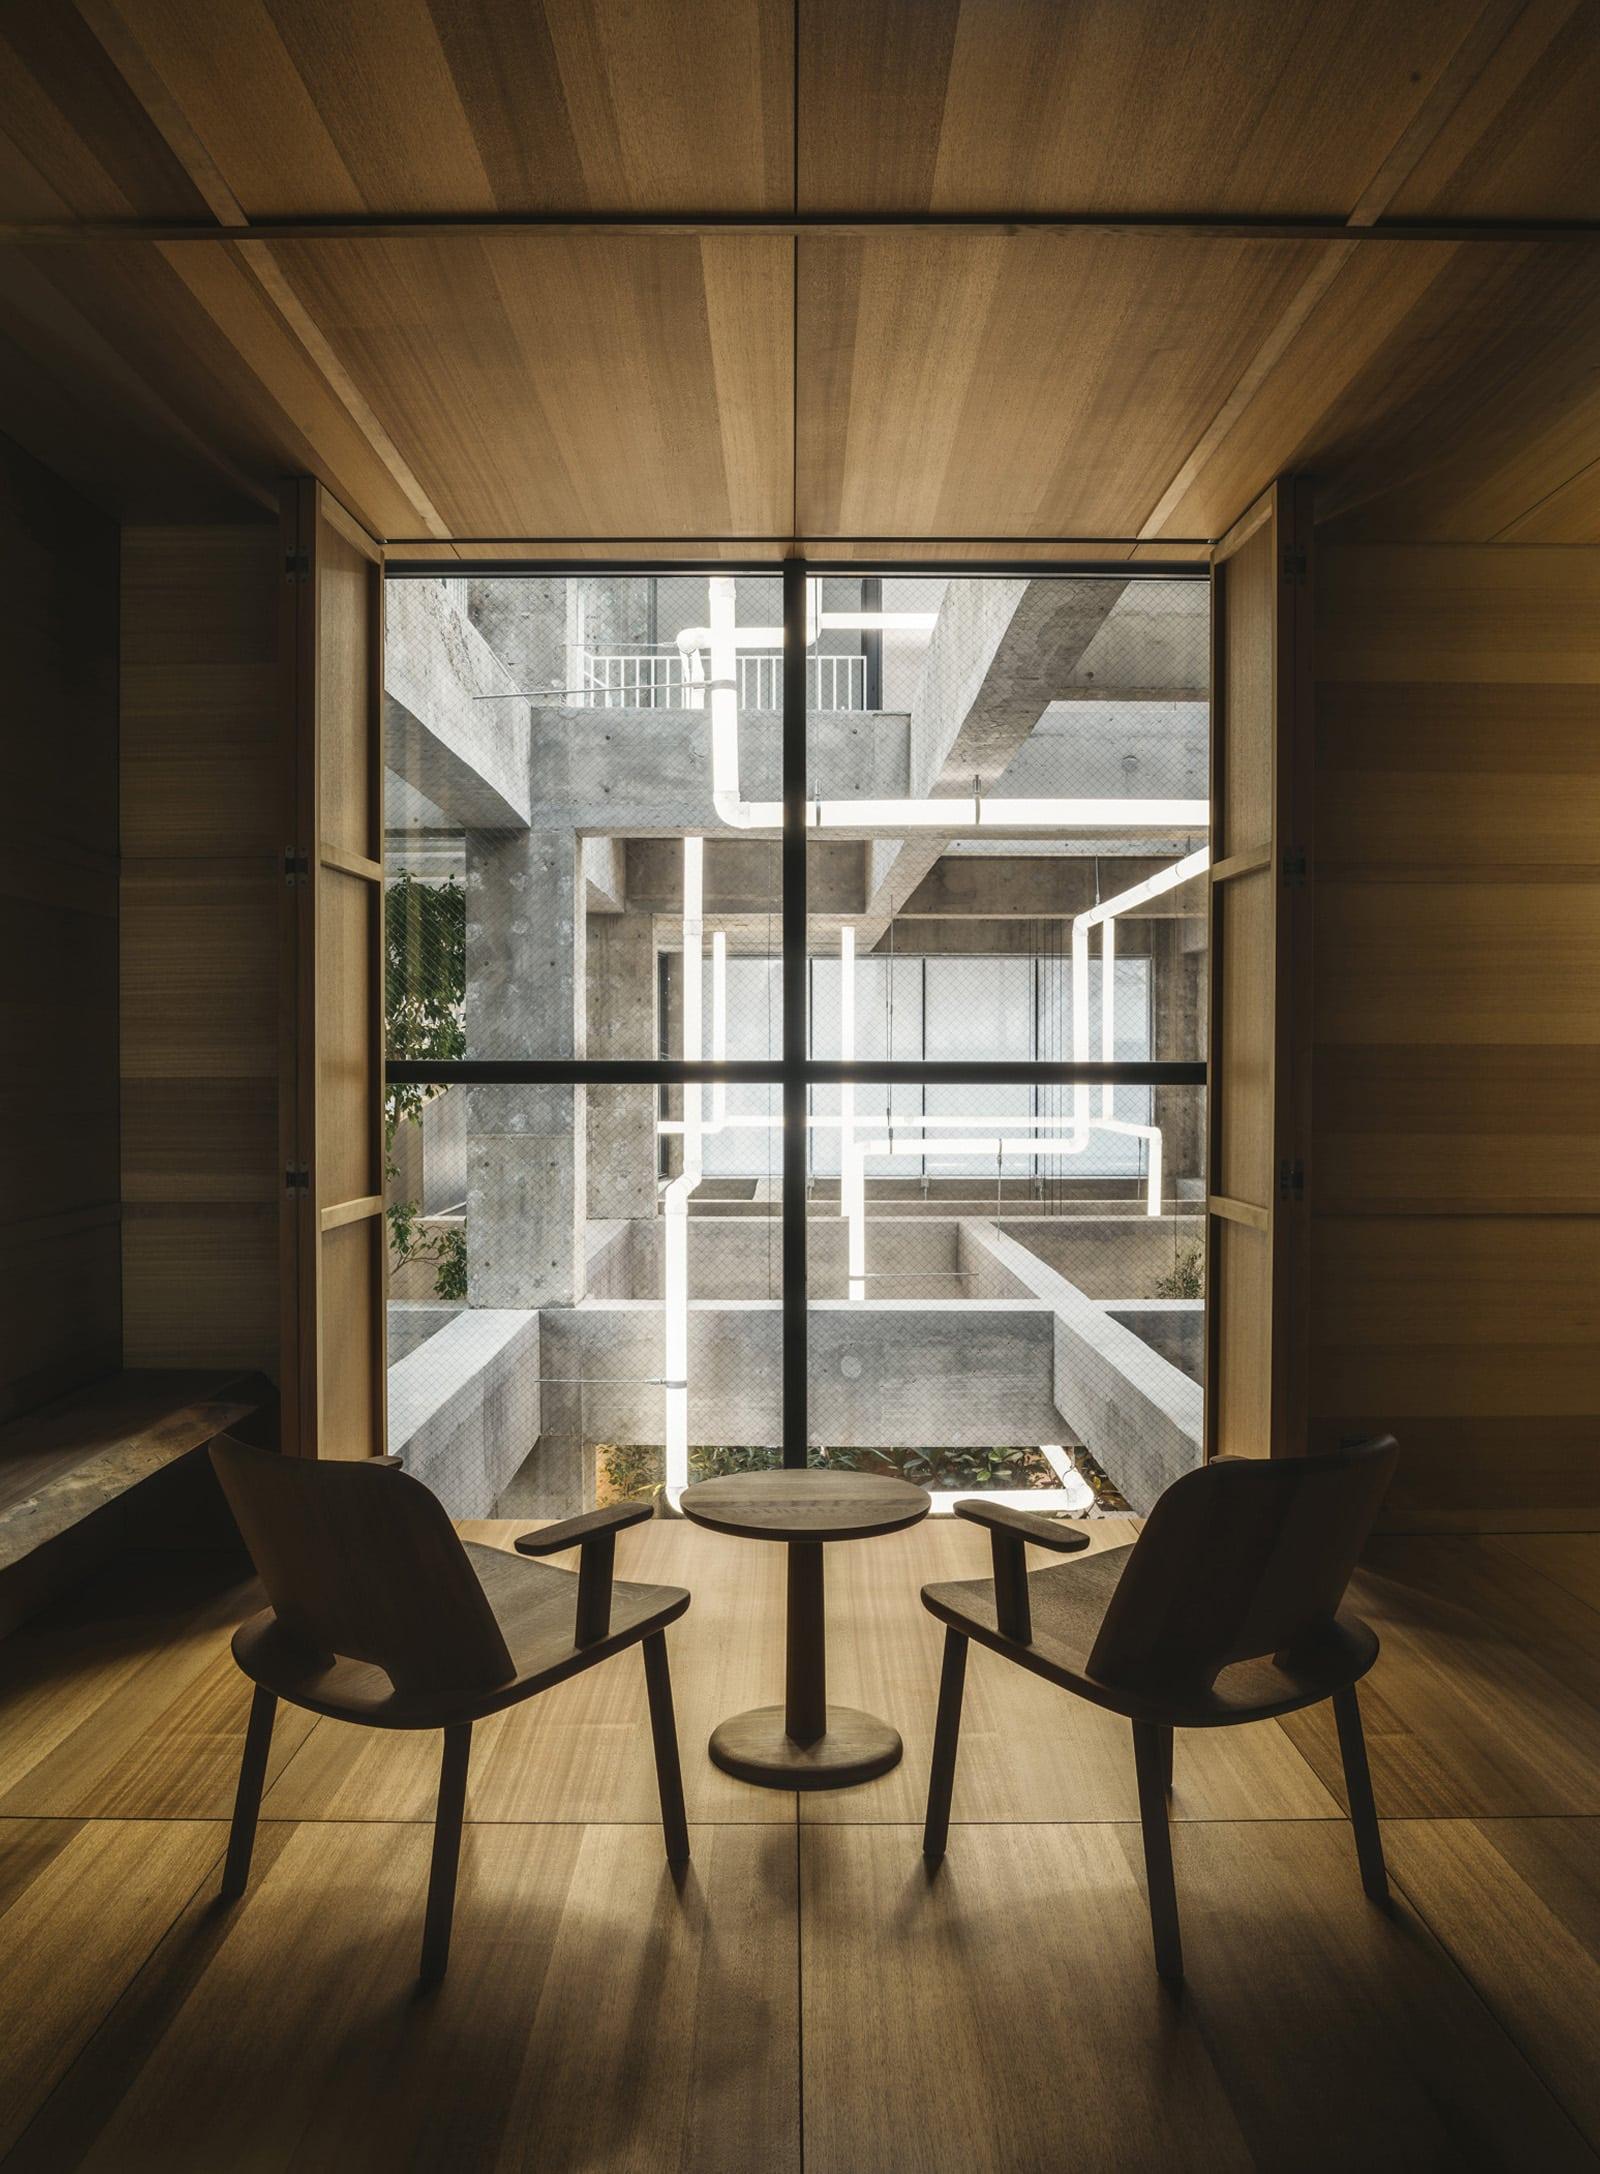 Shiroiya Hotel  - 20210816 SouFujimoto ShiroiyaHotel 07.2 1 47